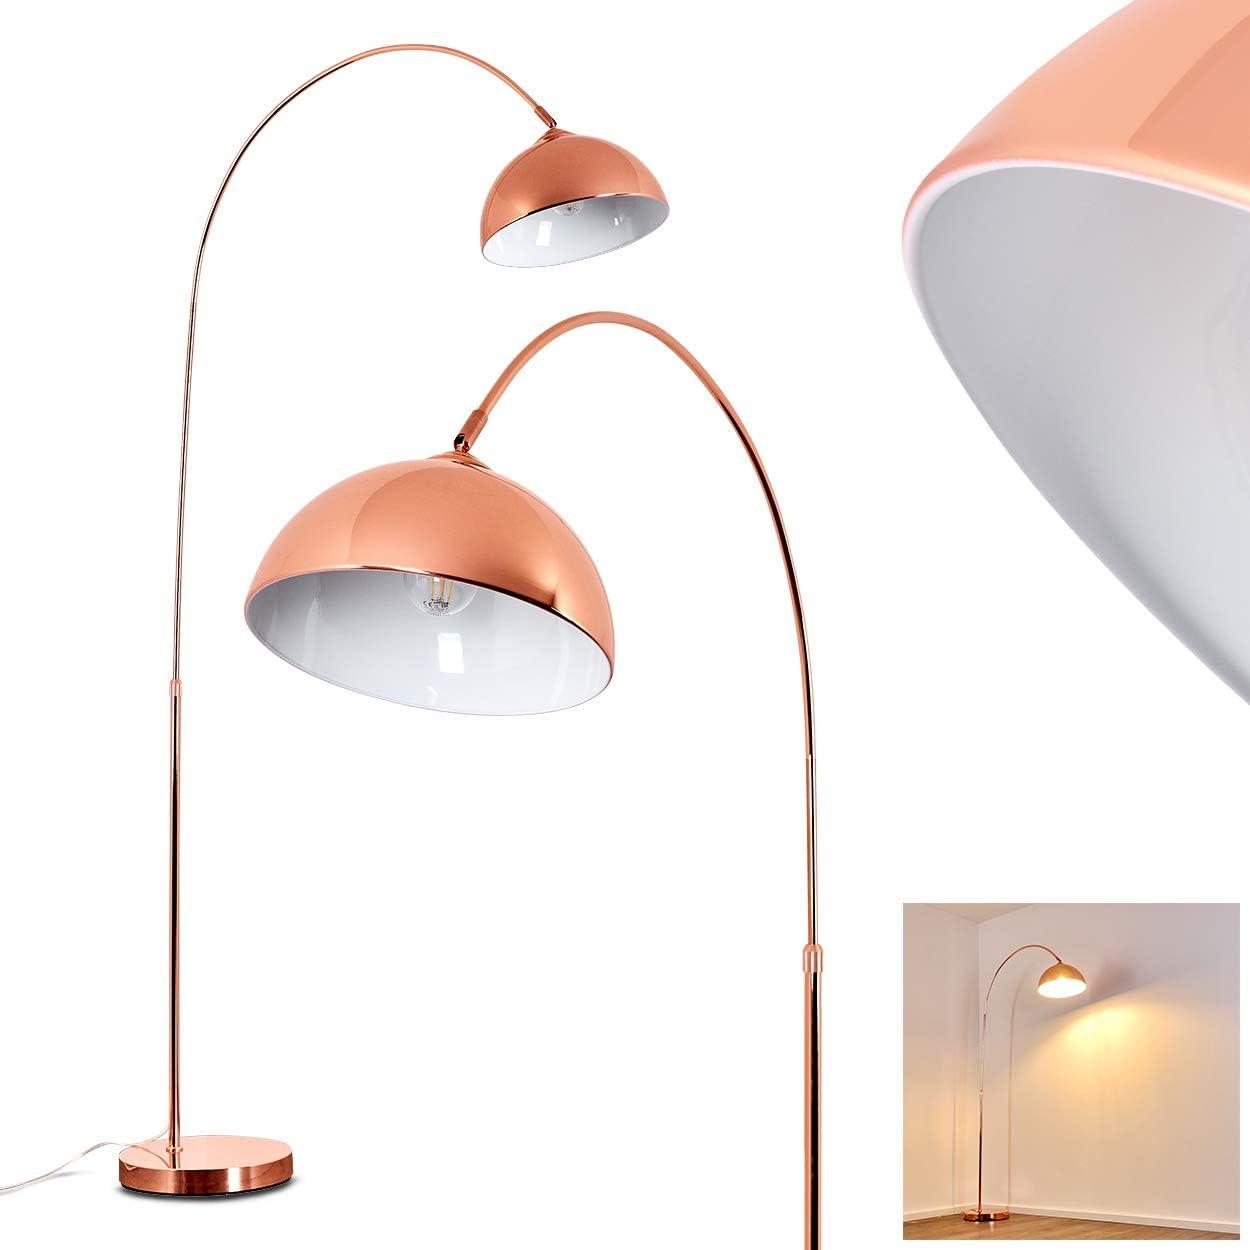 Stehlampe Tipitapa Moderne Stehleuchte Aus Metall In Kupfer Weiss